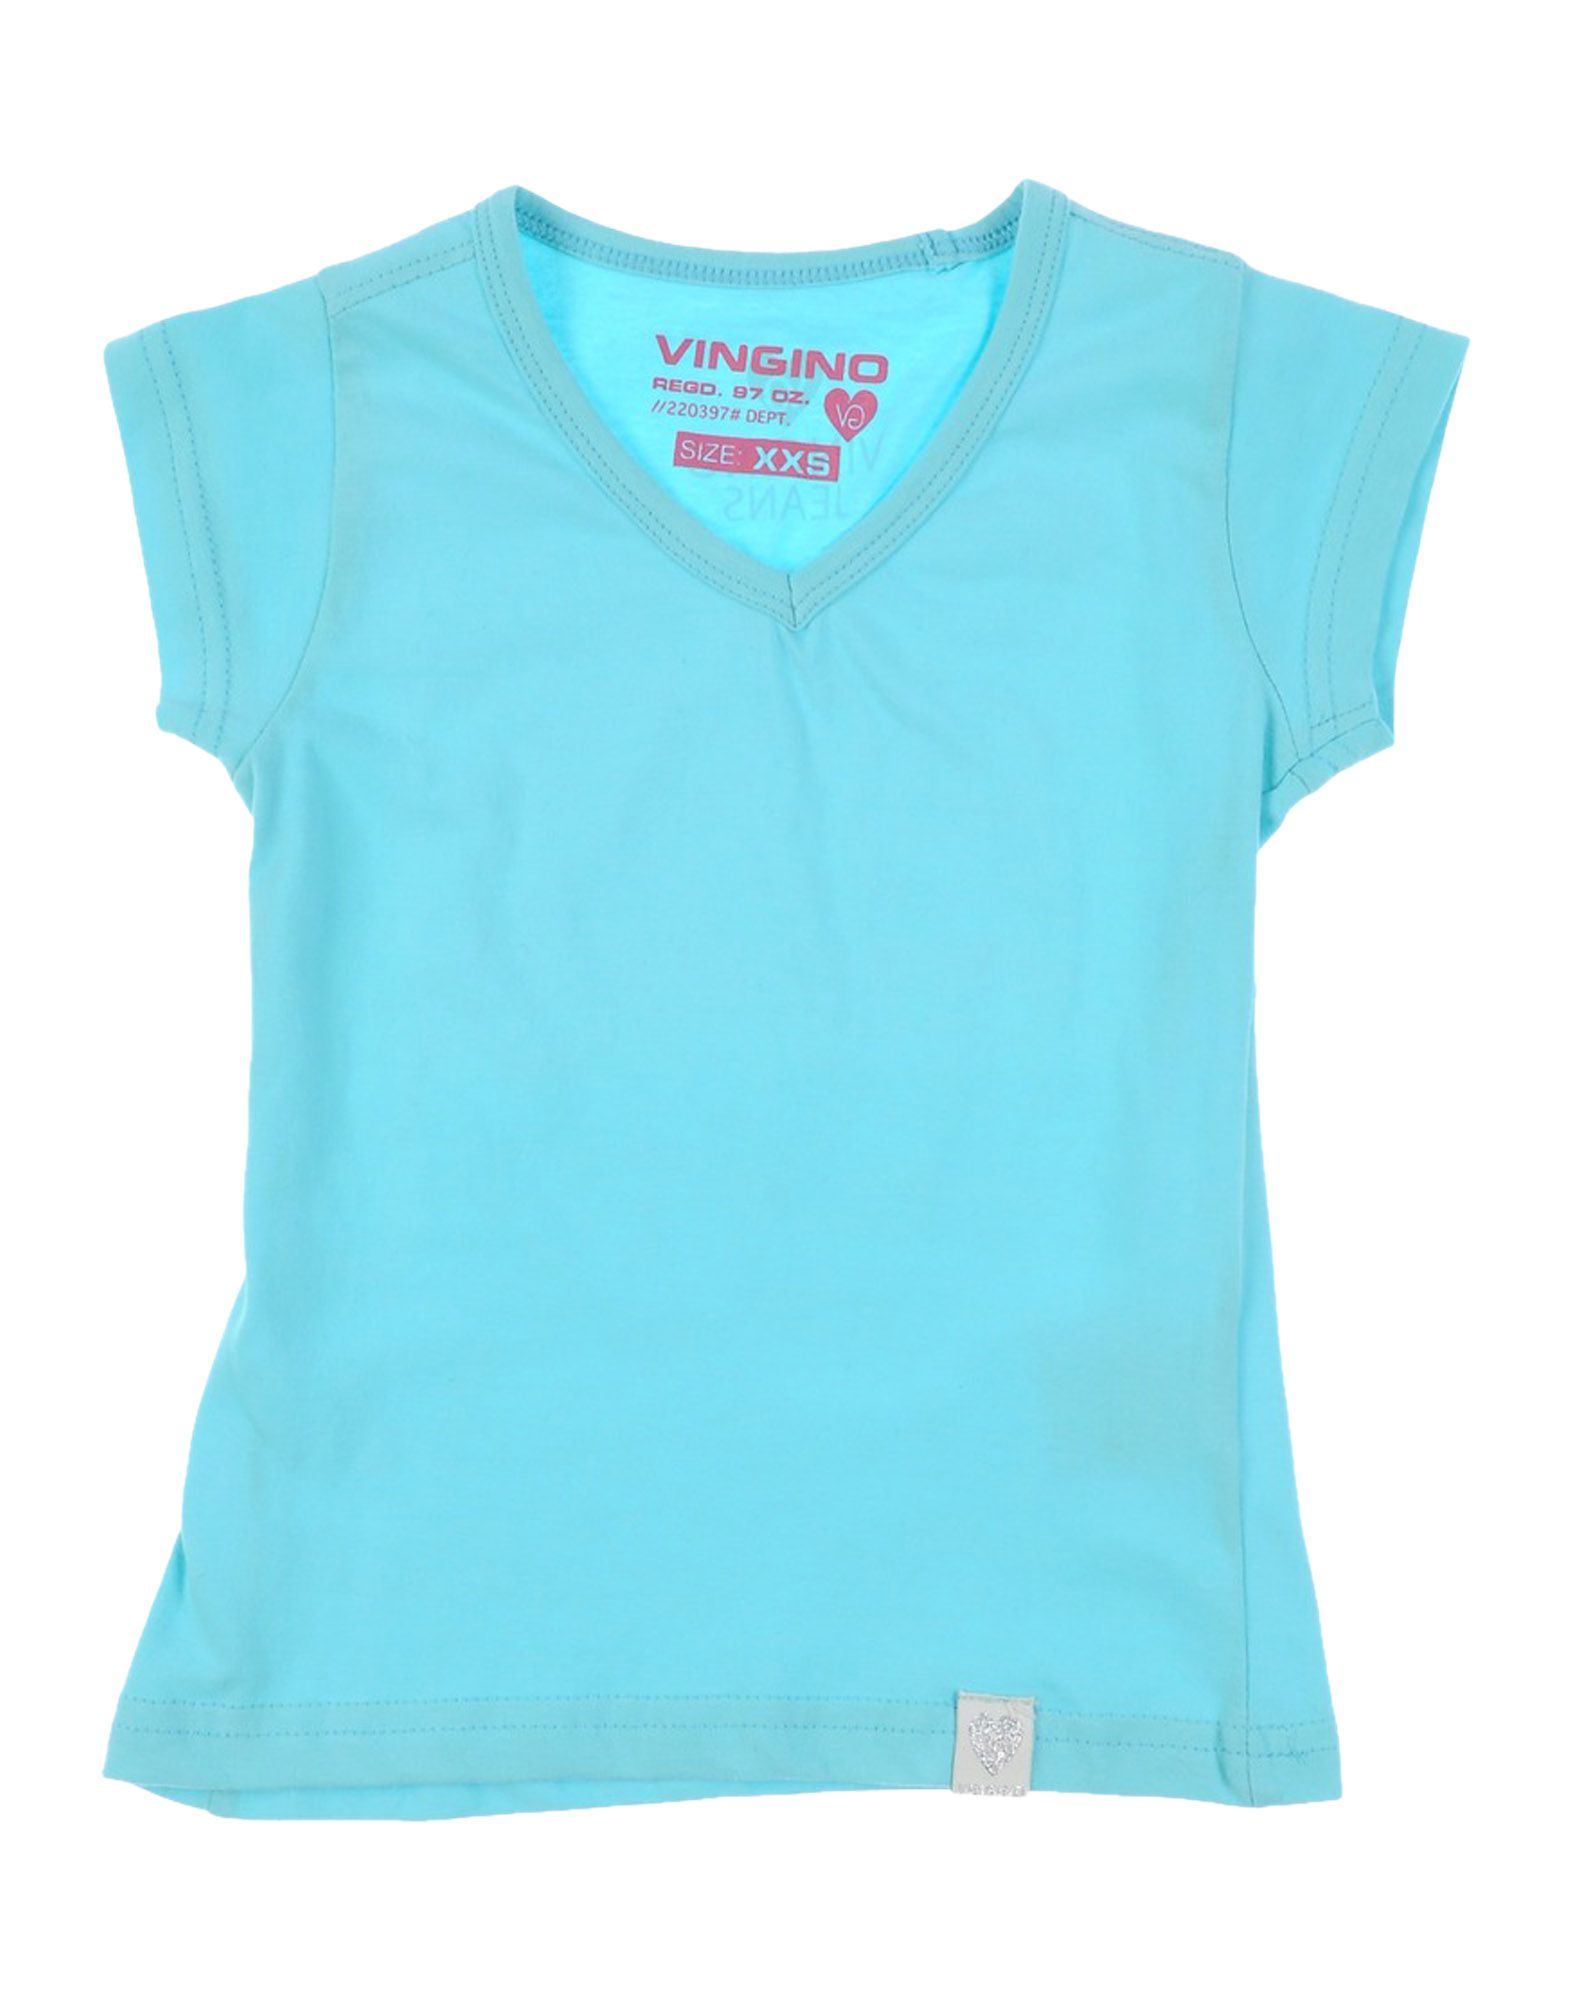 VINGINO Mädchen 0-24 monate T-shirts Farbe Himmelblau Größe 3